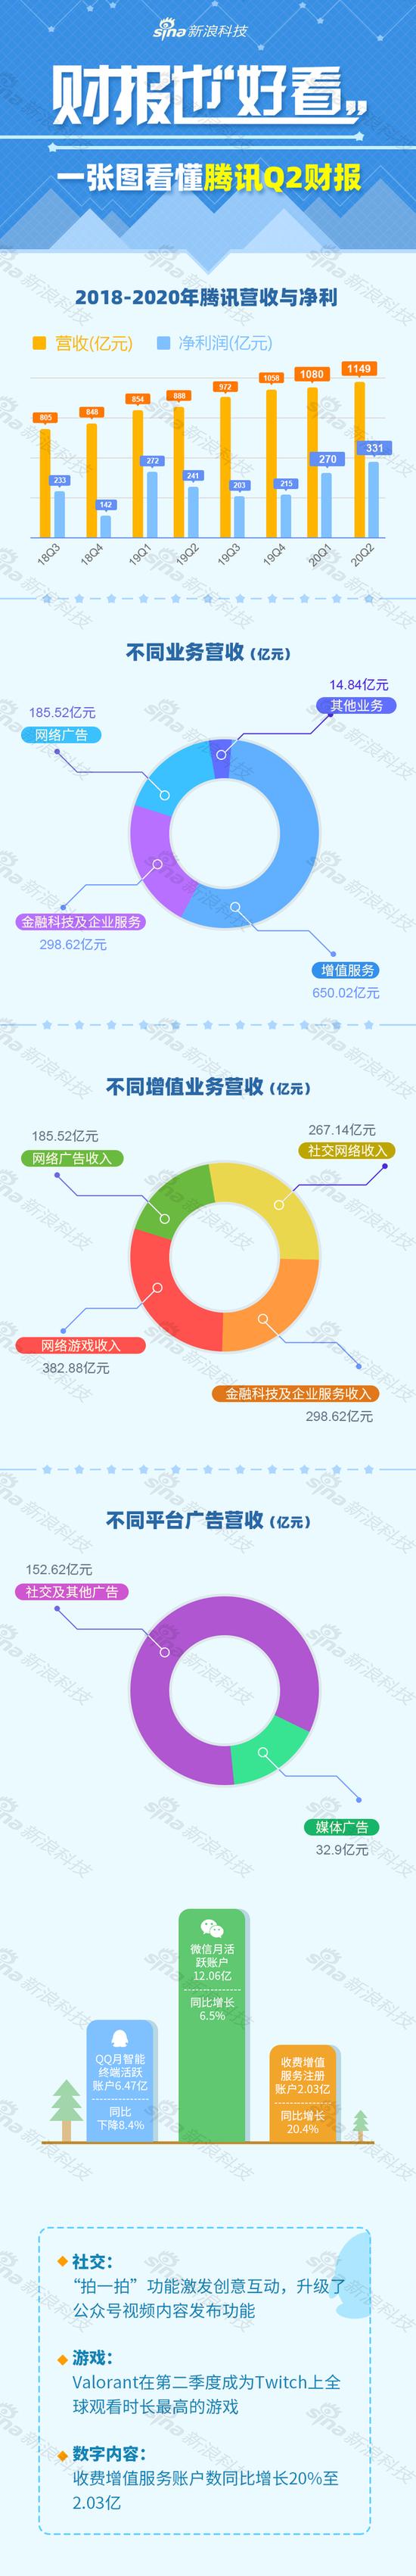 https://n.sinaimg.cn/tech/transform/753/w550h3403/20200812/e5af-ixreehp2381057.png